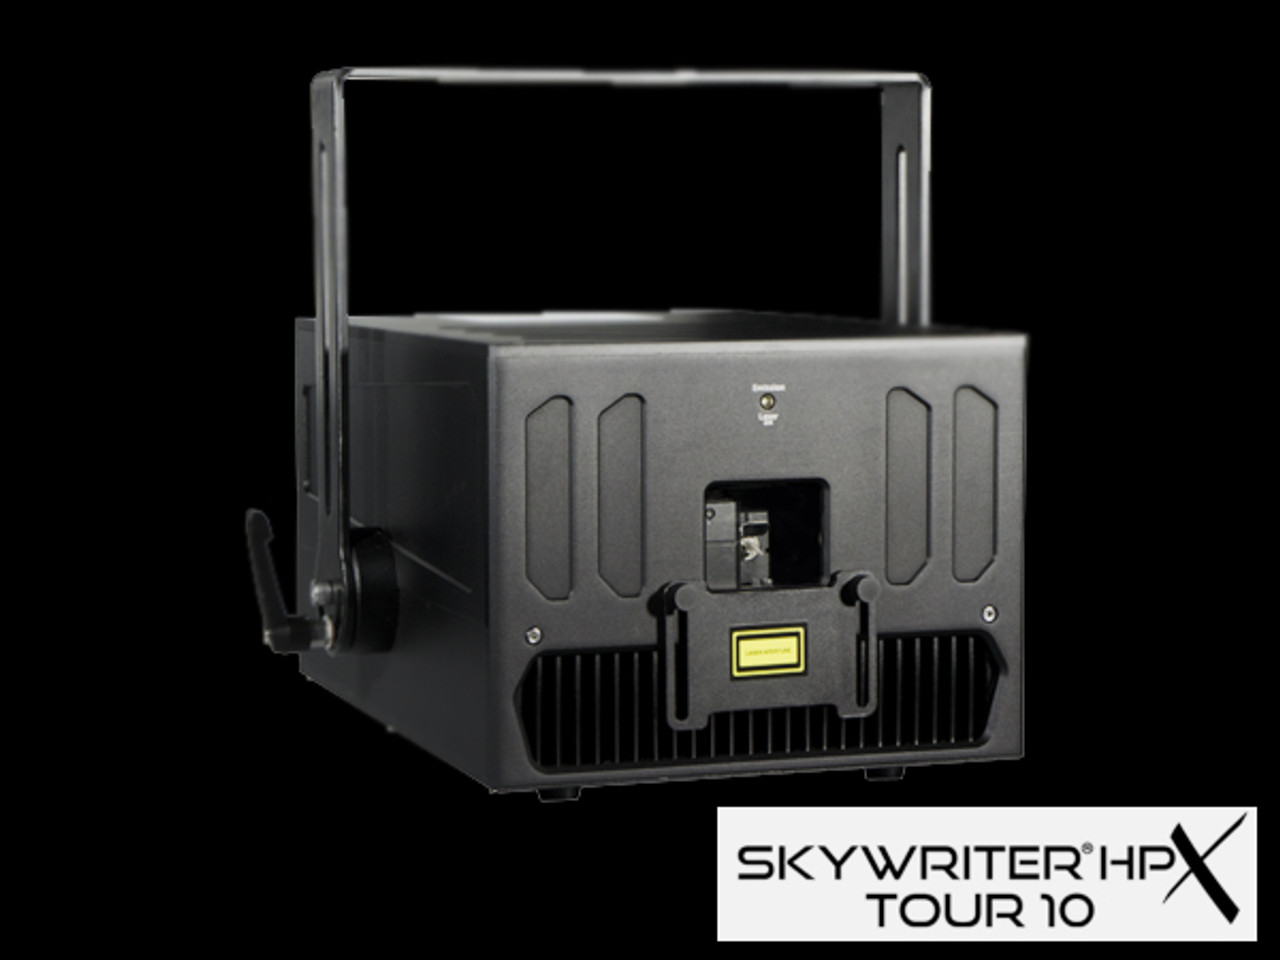 Skywriter HPX 10 (10W full RGB)